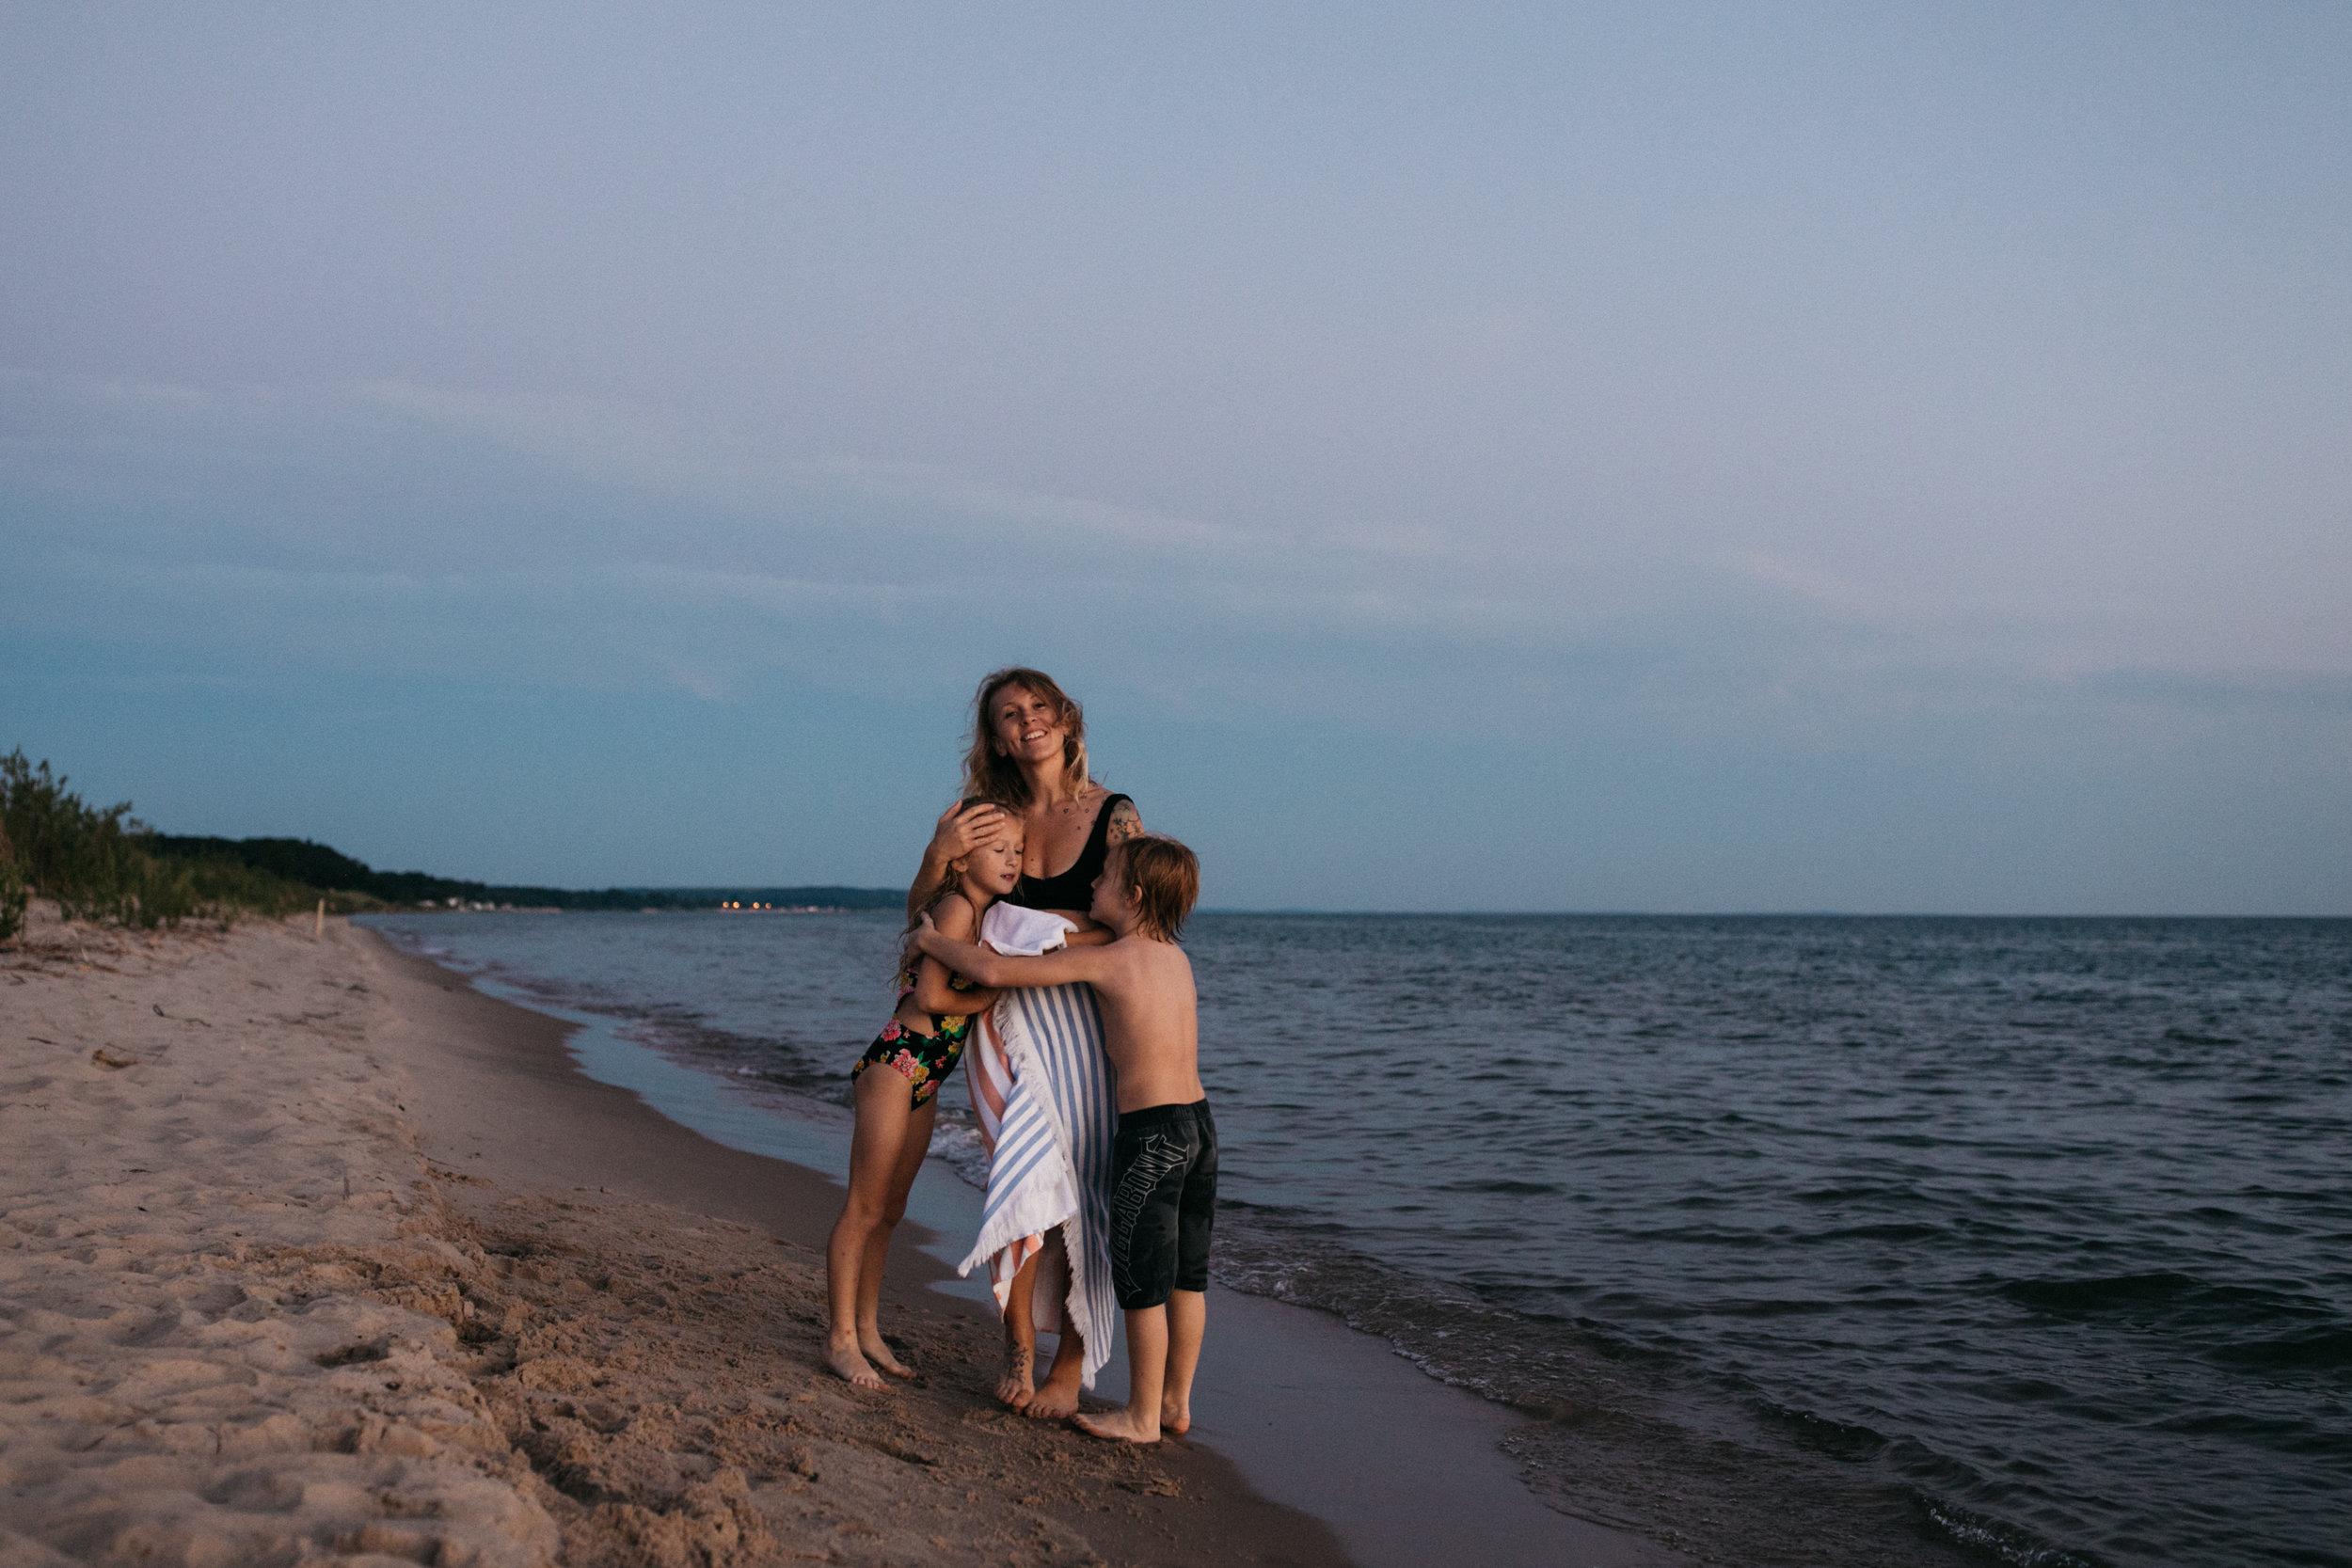 michigan-storytelling-photographer-ludington-beach-live-460.jpg